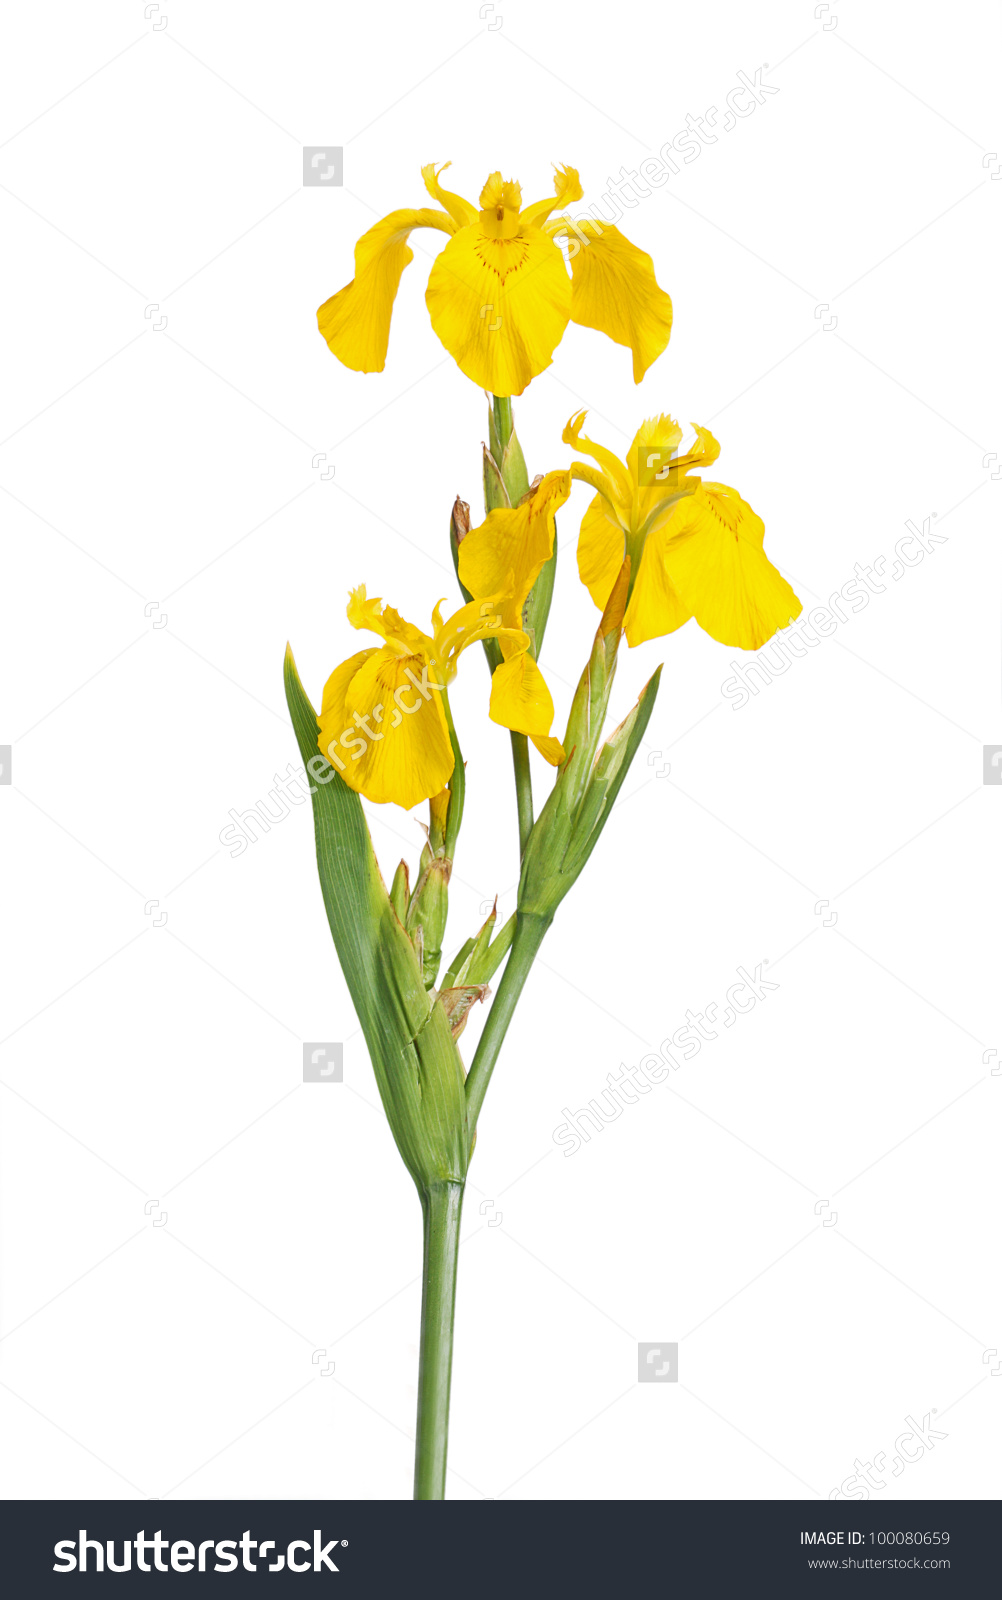 Stem Three Flowers European Yellow Flag Stock Photo 100080659.